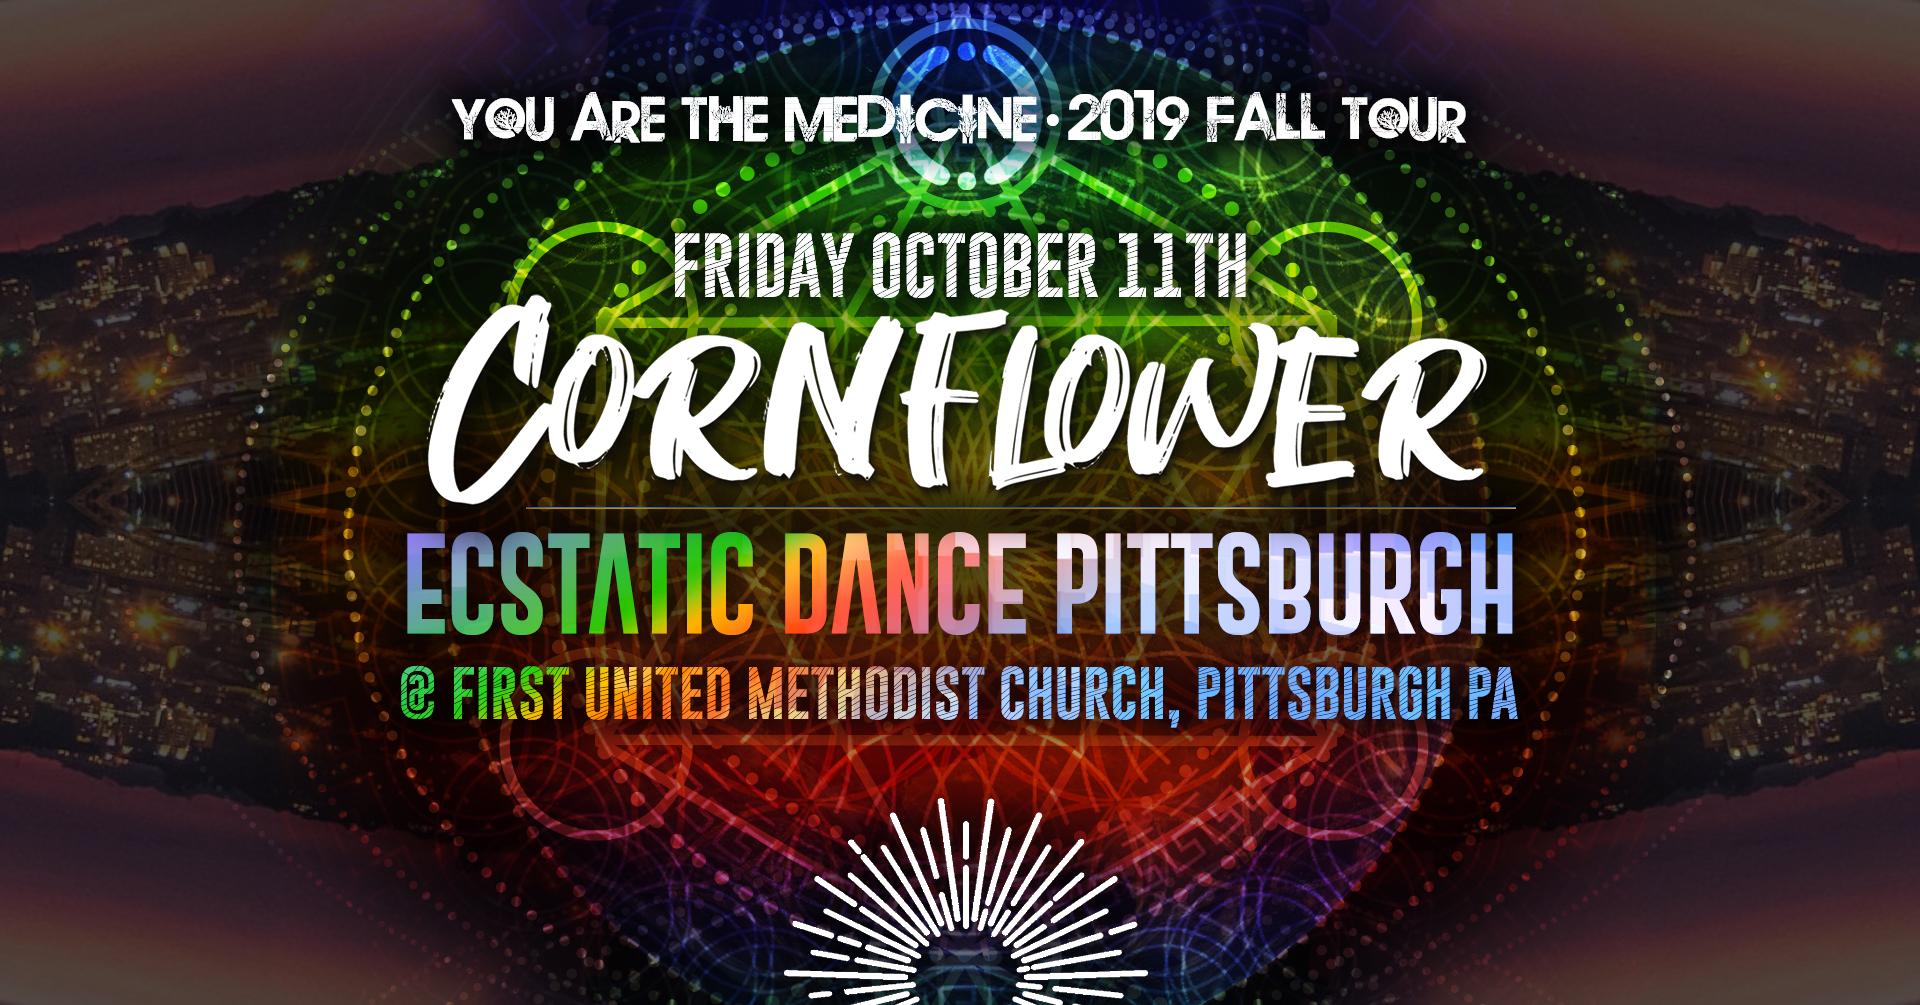 20191011-PA-Pittsburgh-EcstaticDance-FB-EventListing-CoverPhoto.jpg